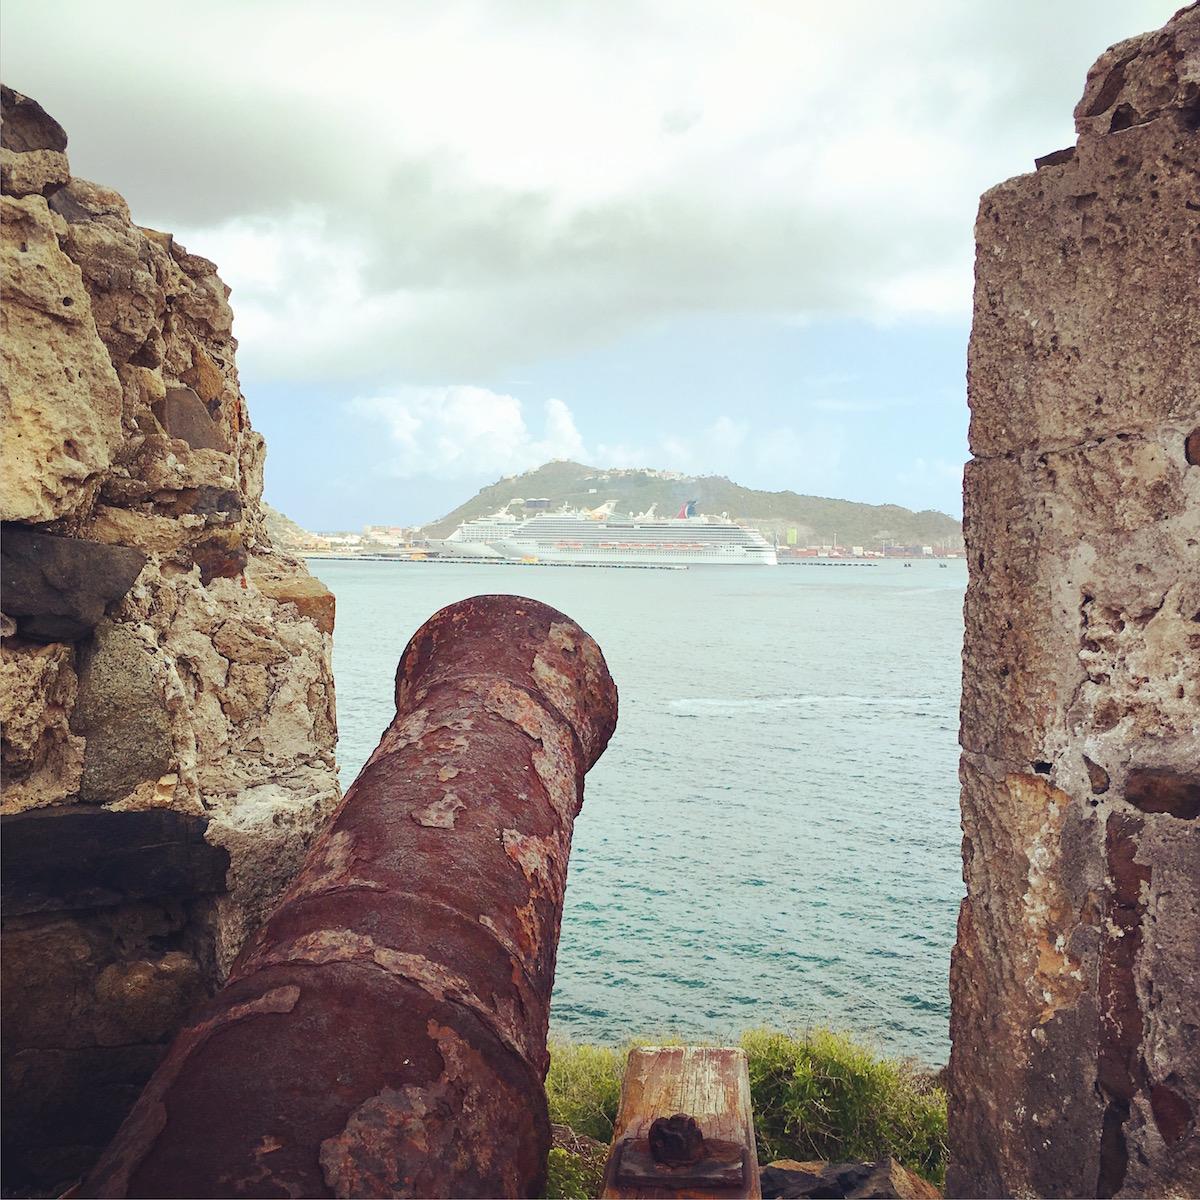 Sint Maarten - Fort Amsterdam cannon